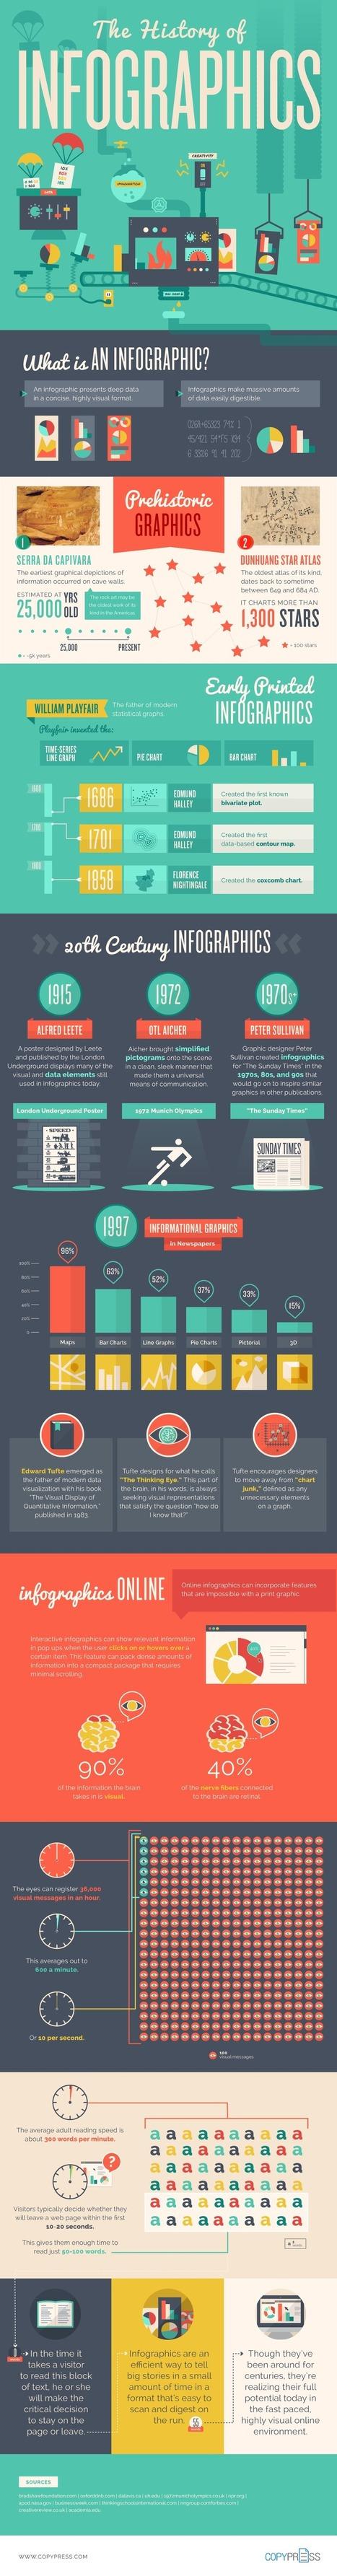 History of Infographics | Les bibliothèques | Scoop.it